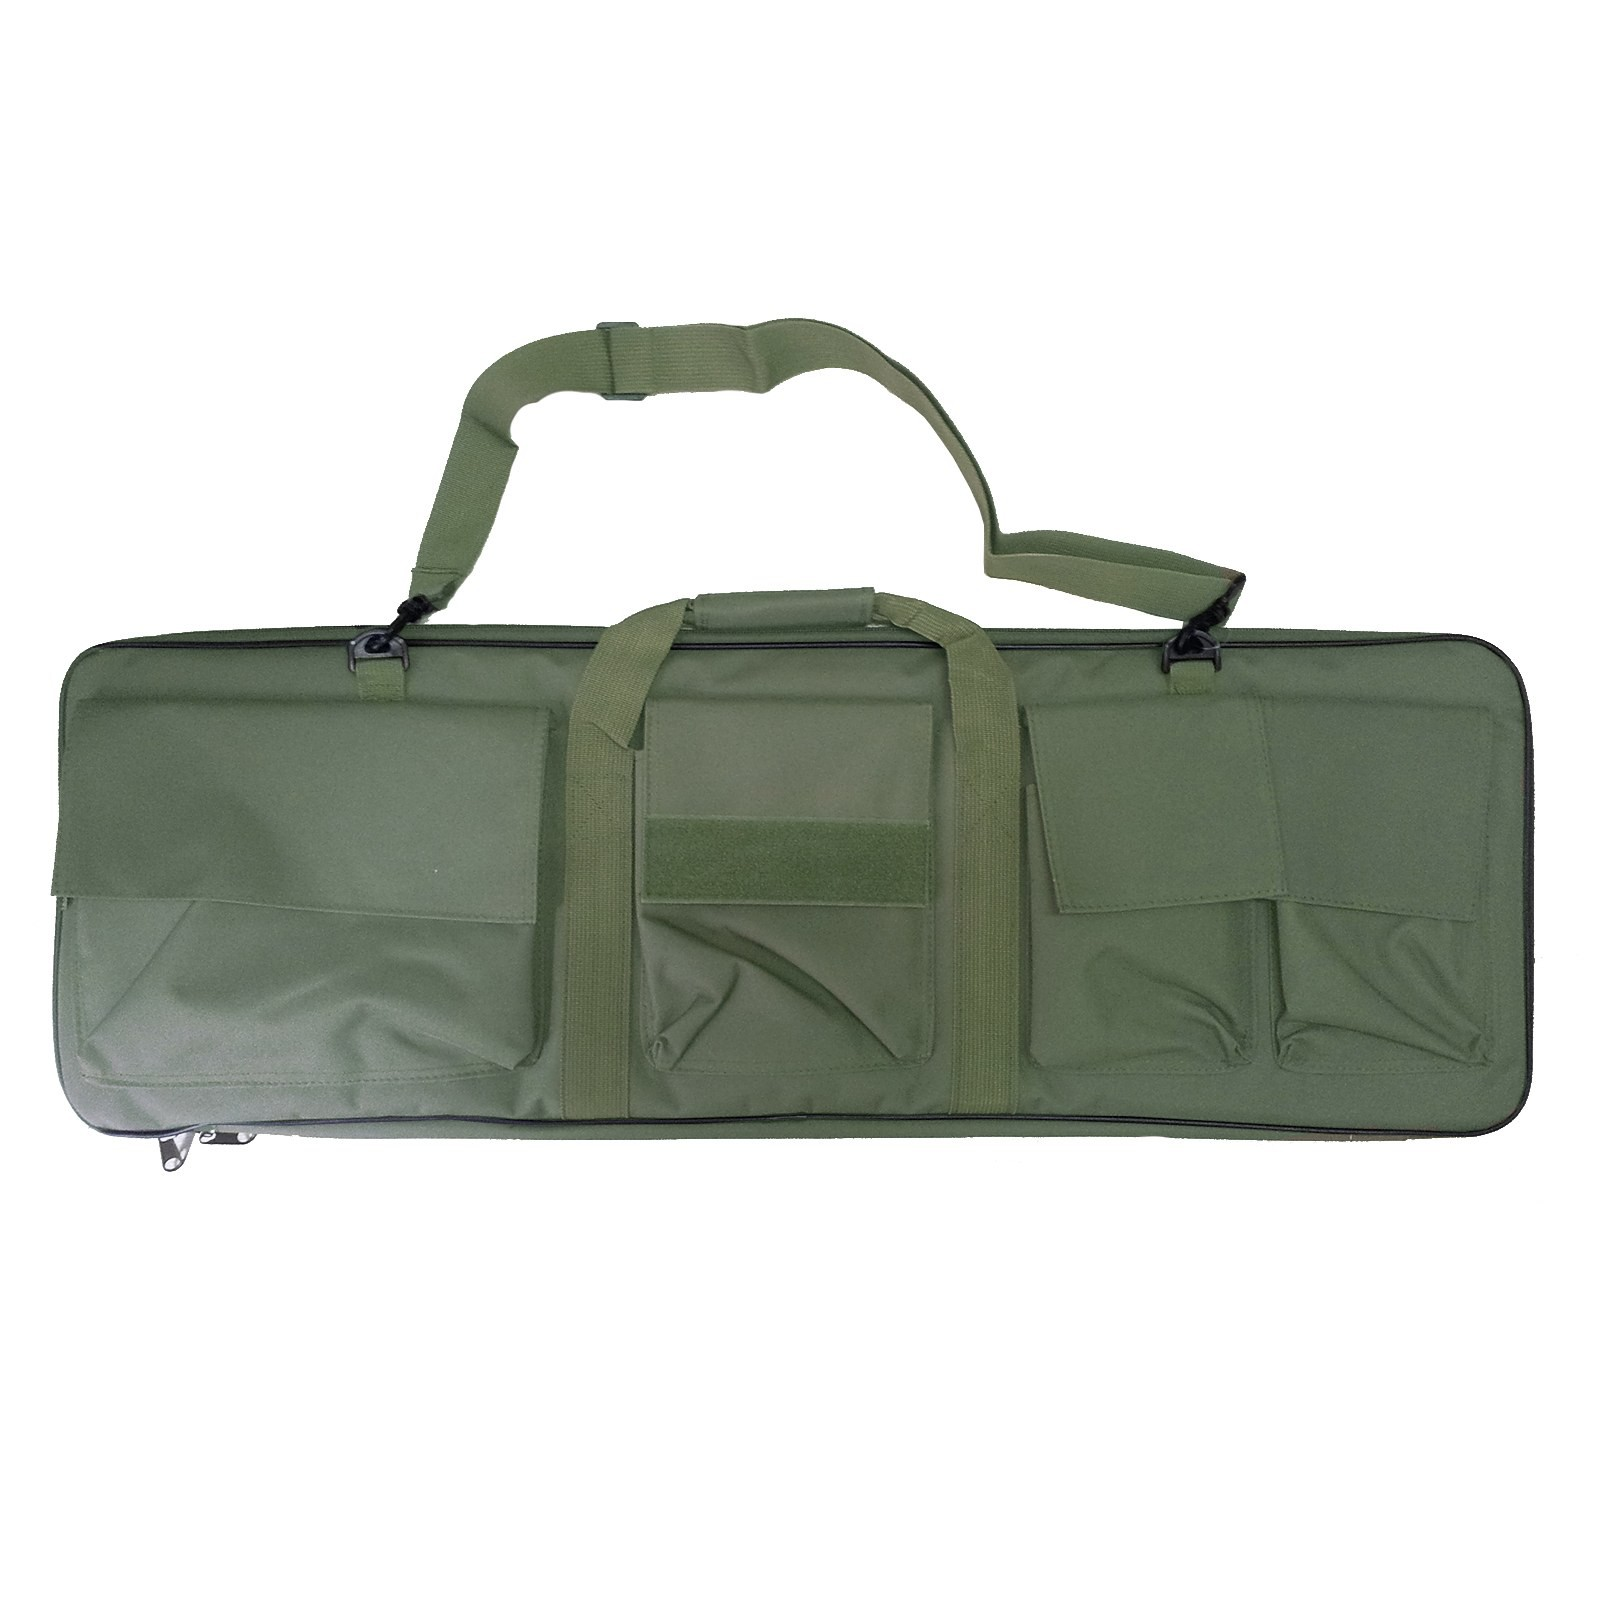 Custodia Sacca per Fucili Cordura per Softair Caccia Verde Militare 88 cm